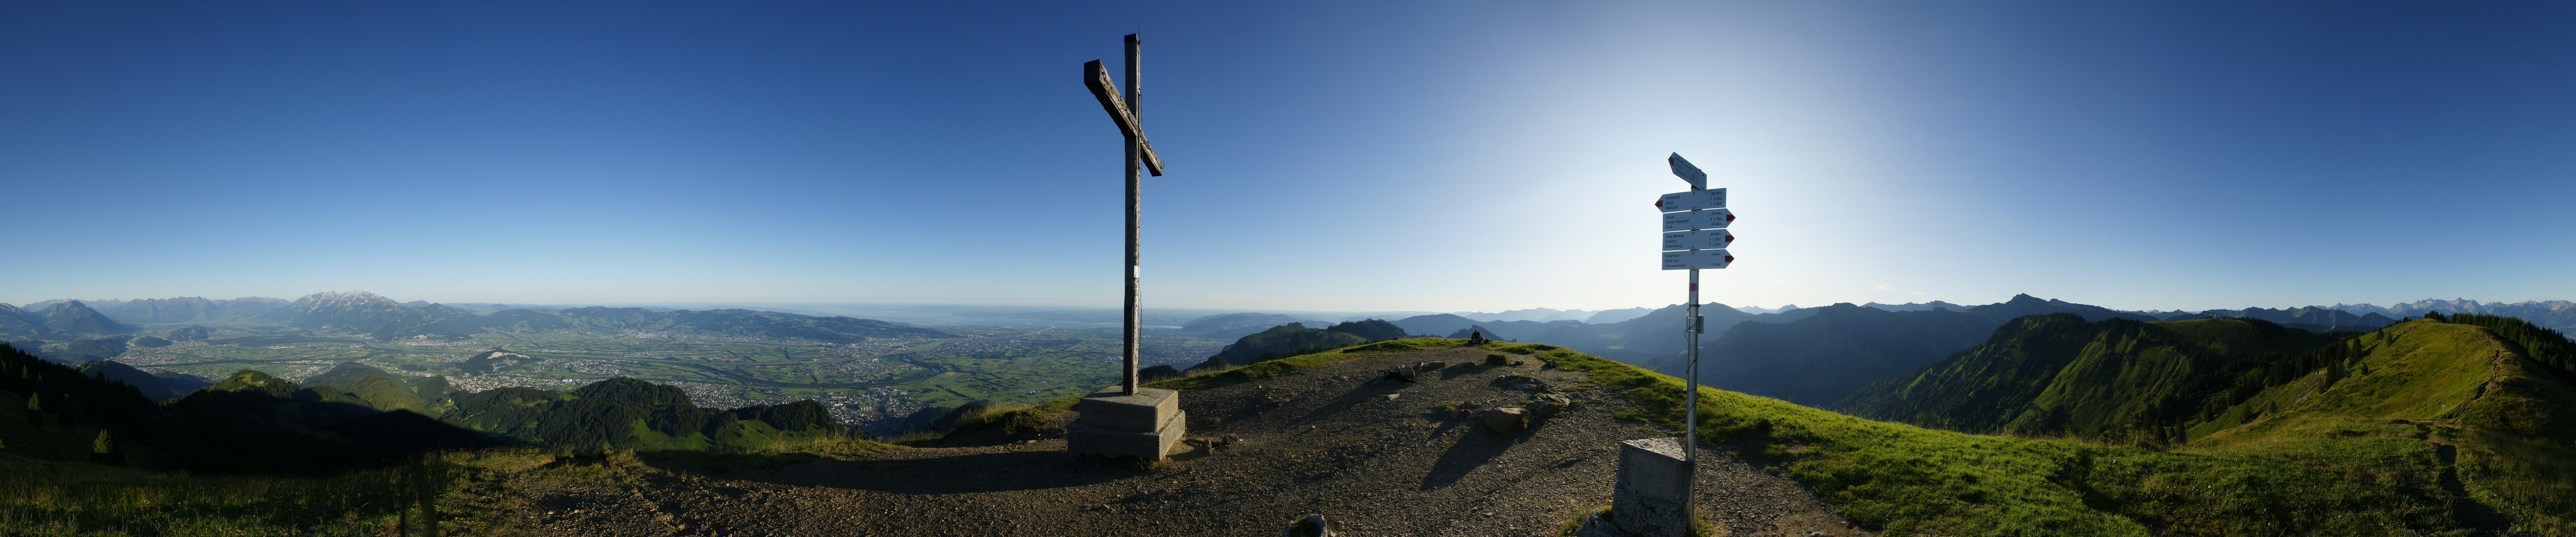 File:360° Hohe Kugel Panorama.jpg